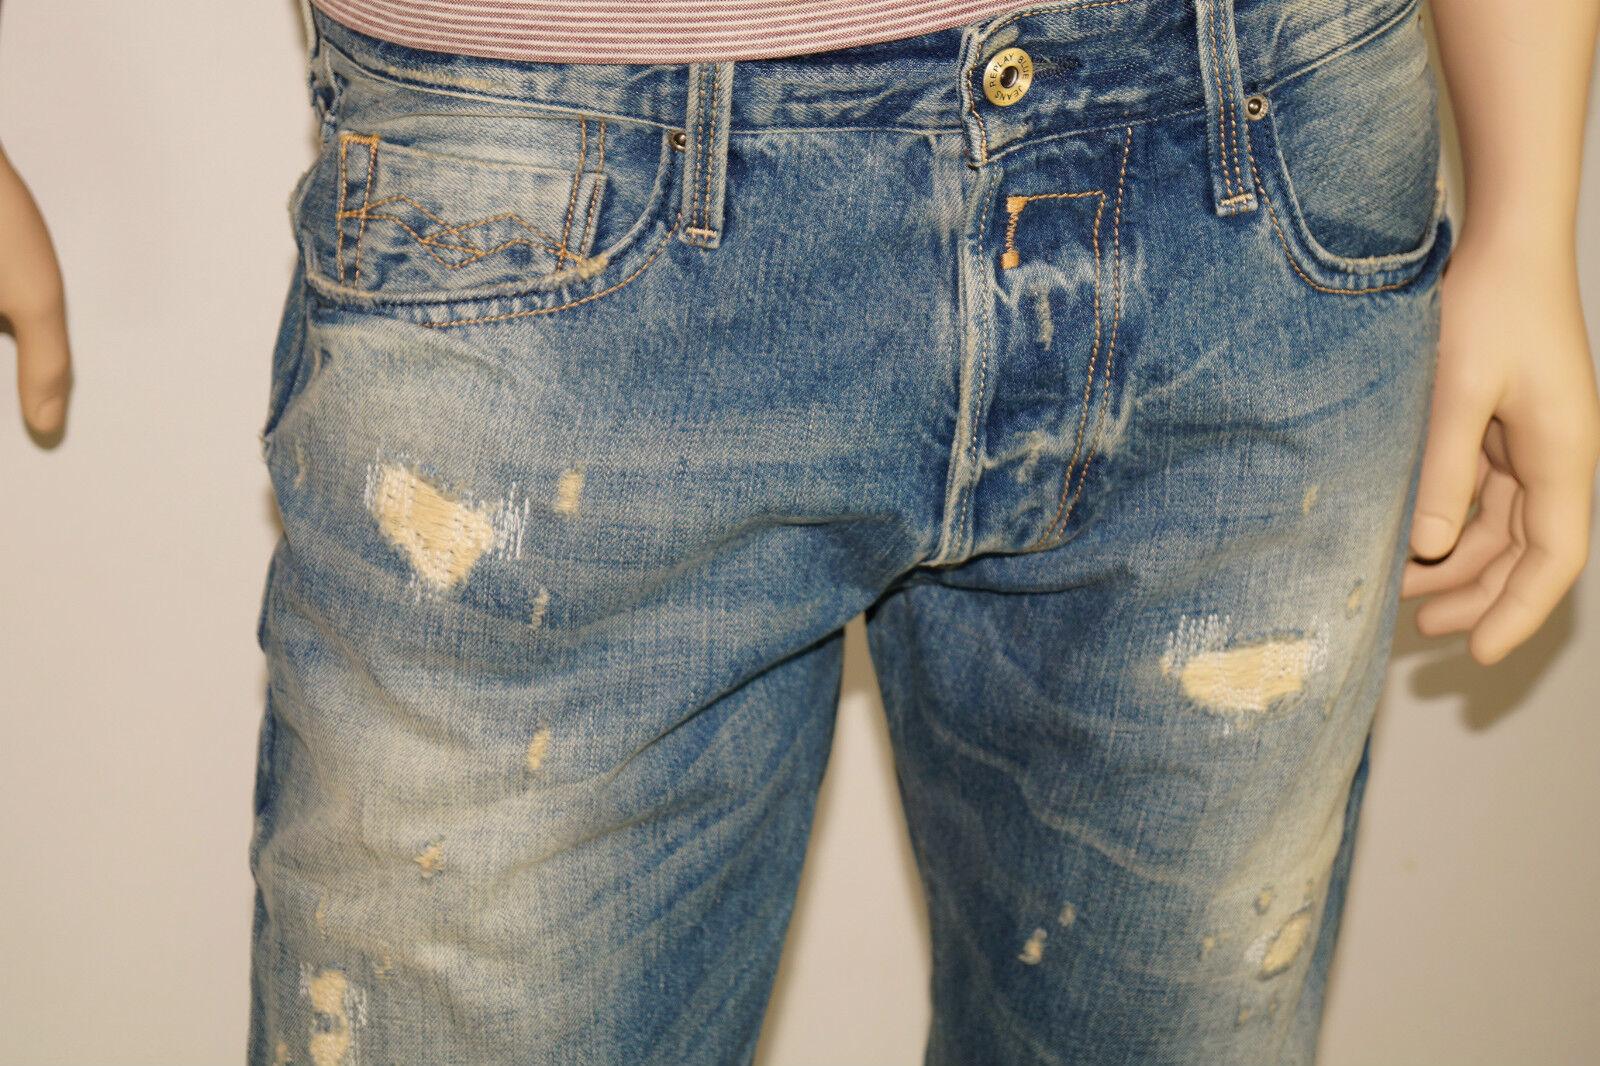 REPLAY Jennon w32 l34 effetto vissuto regular straight fit jeans uomo m99 32 34